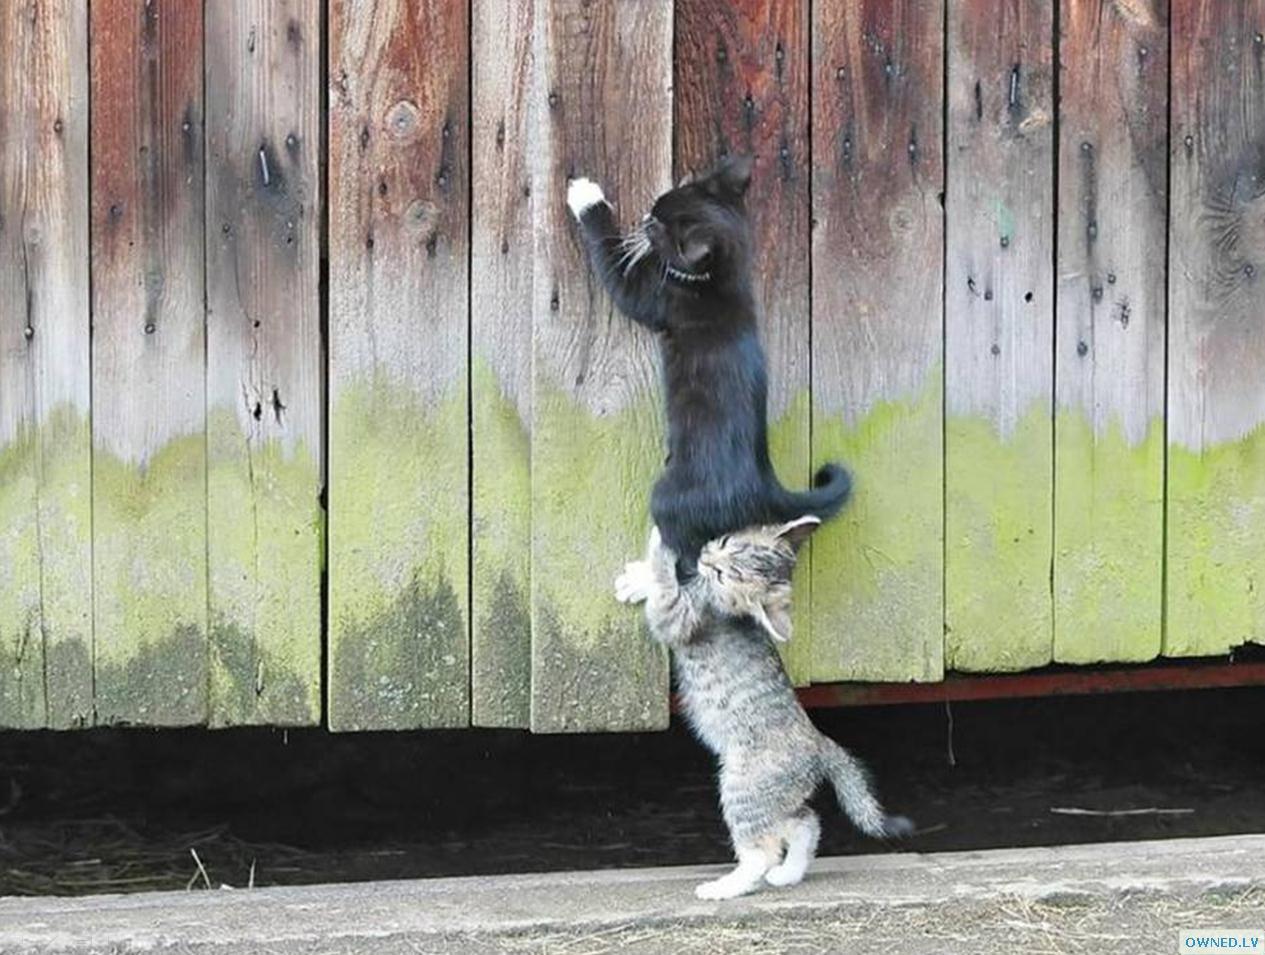 Team work kittens